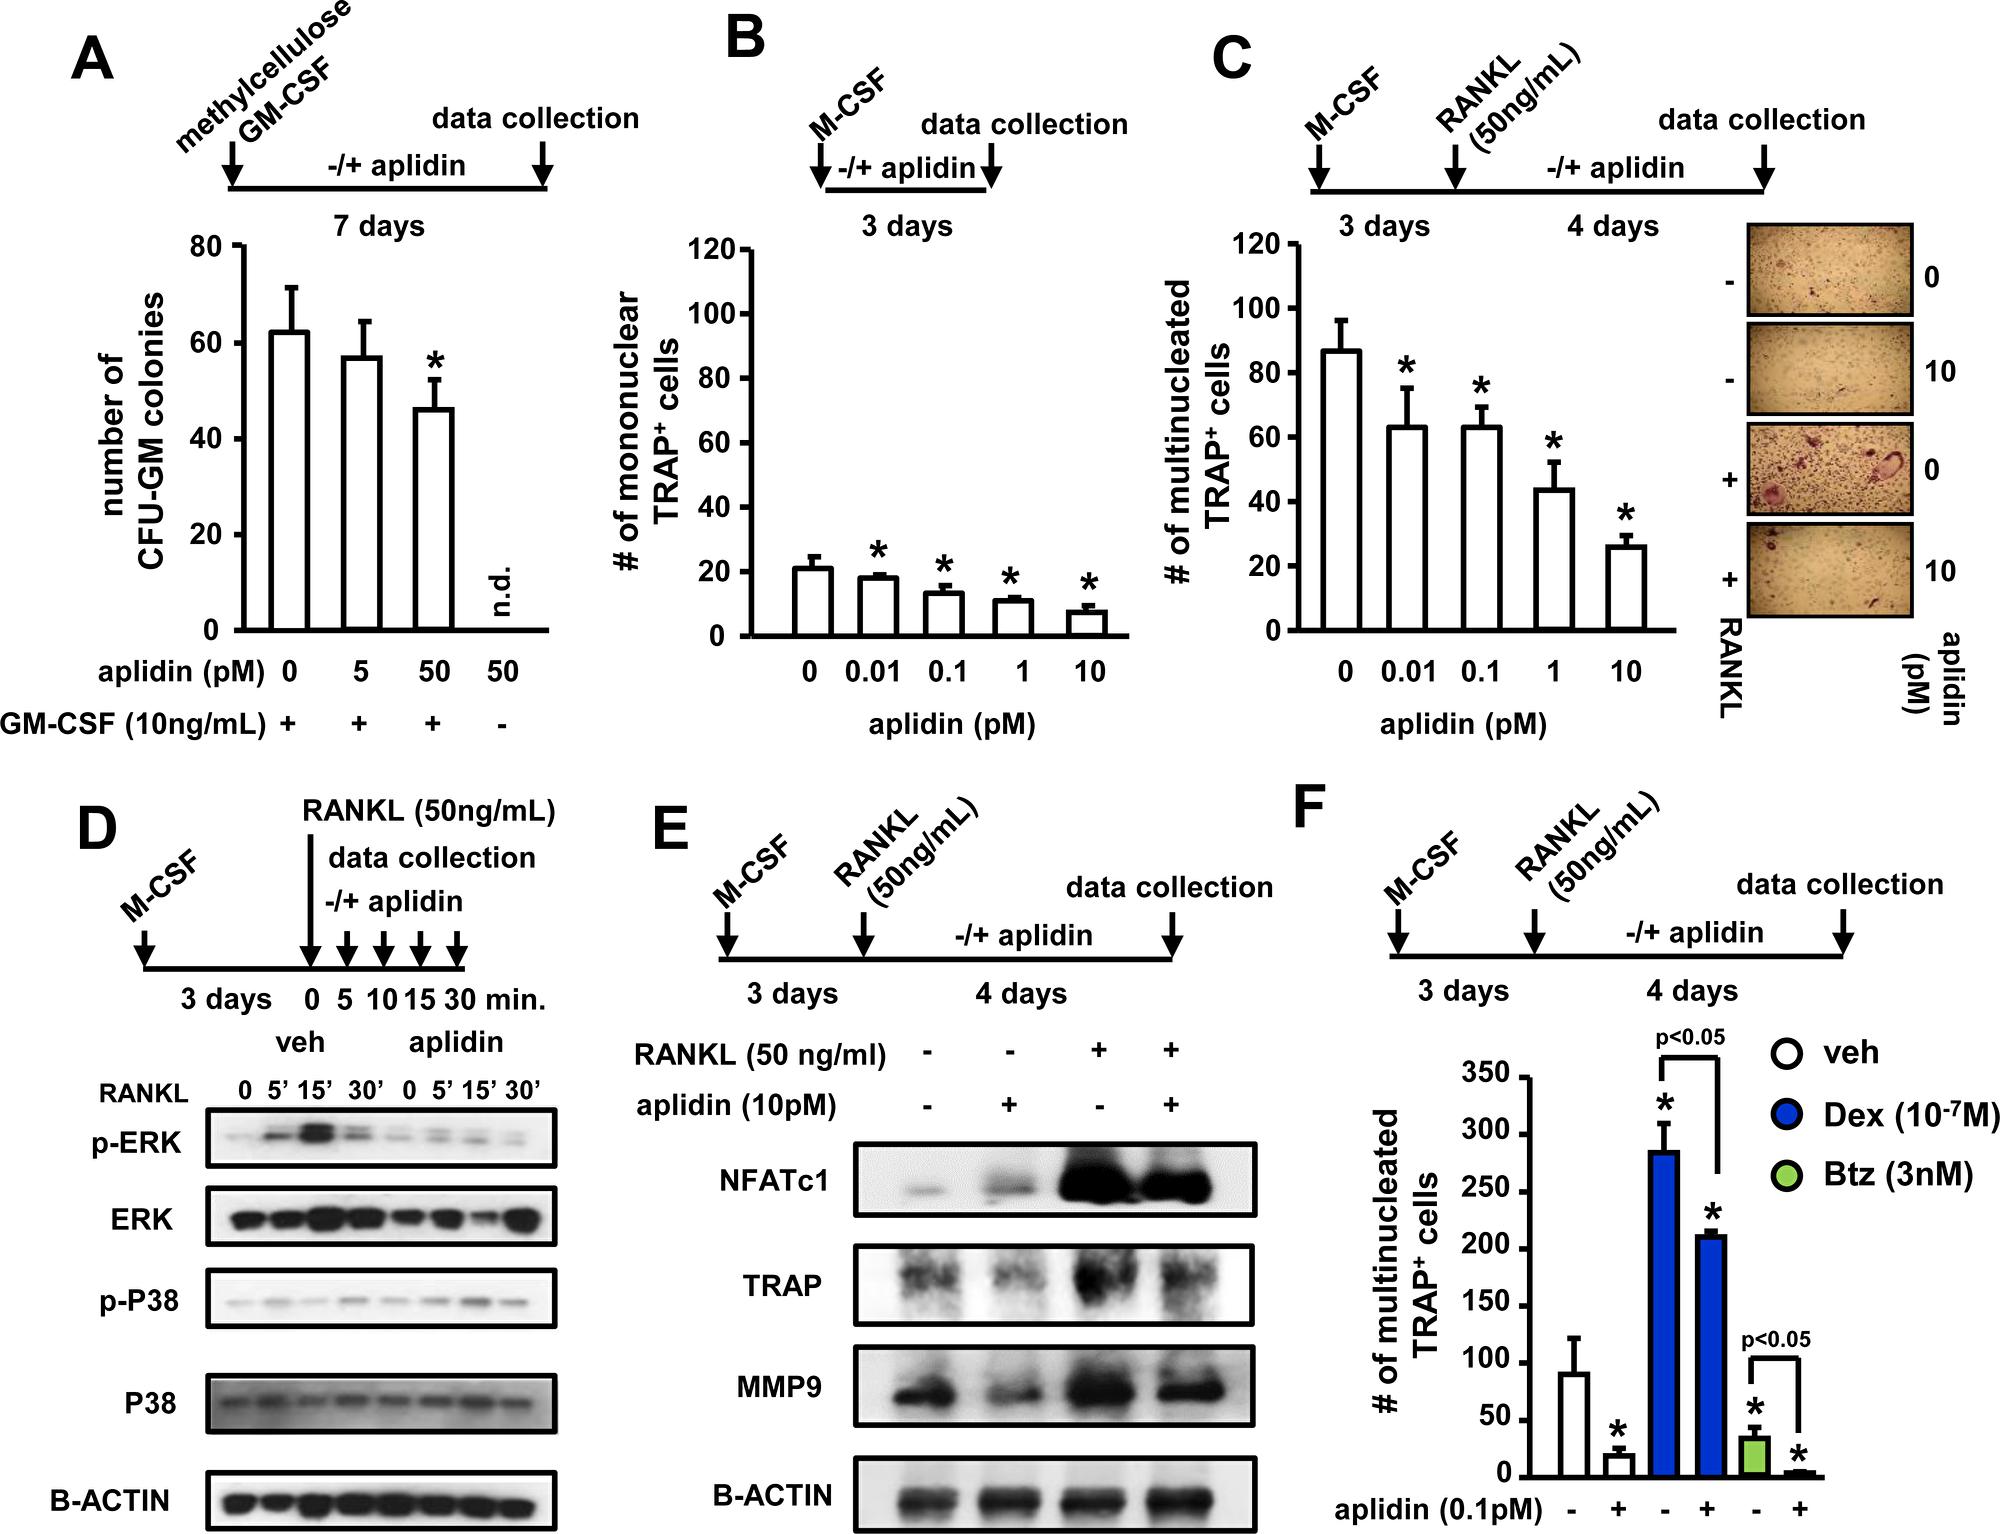 Aplidin inhibits osteoclast precursor expansion and differentiation.